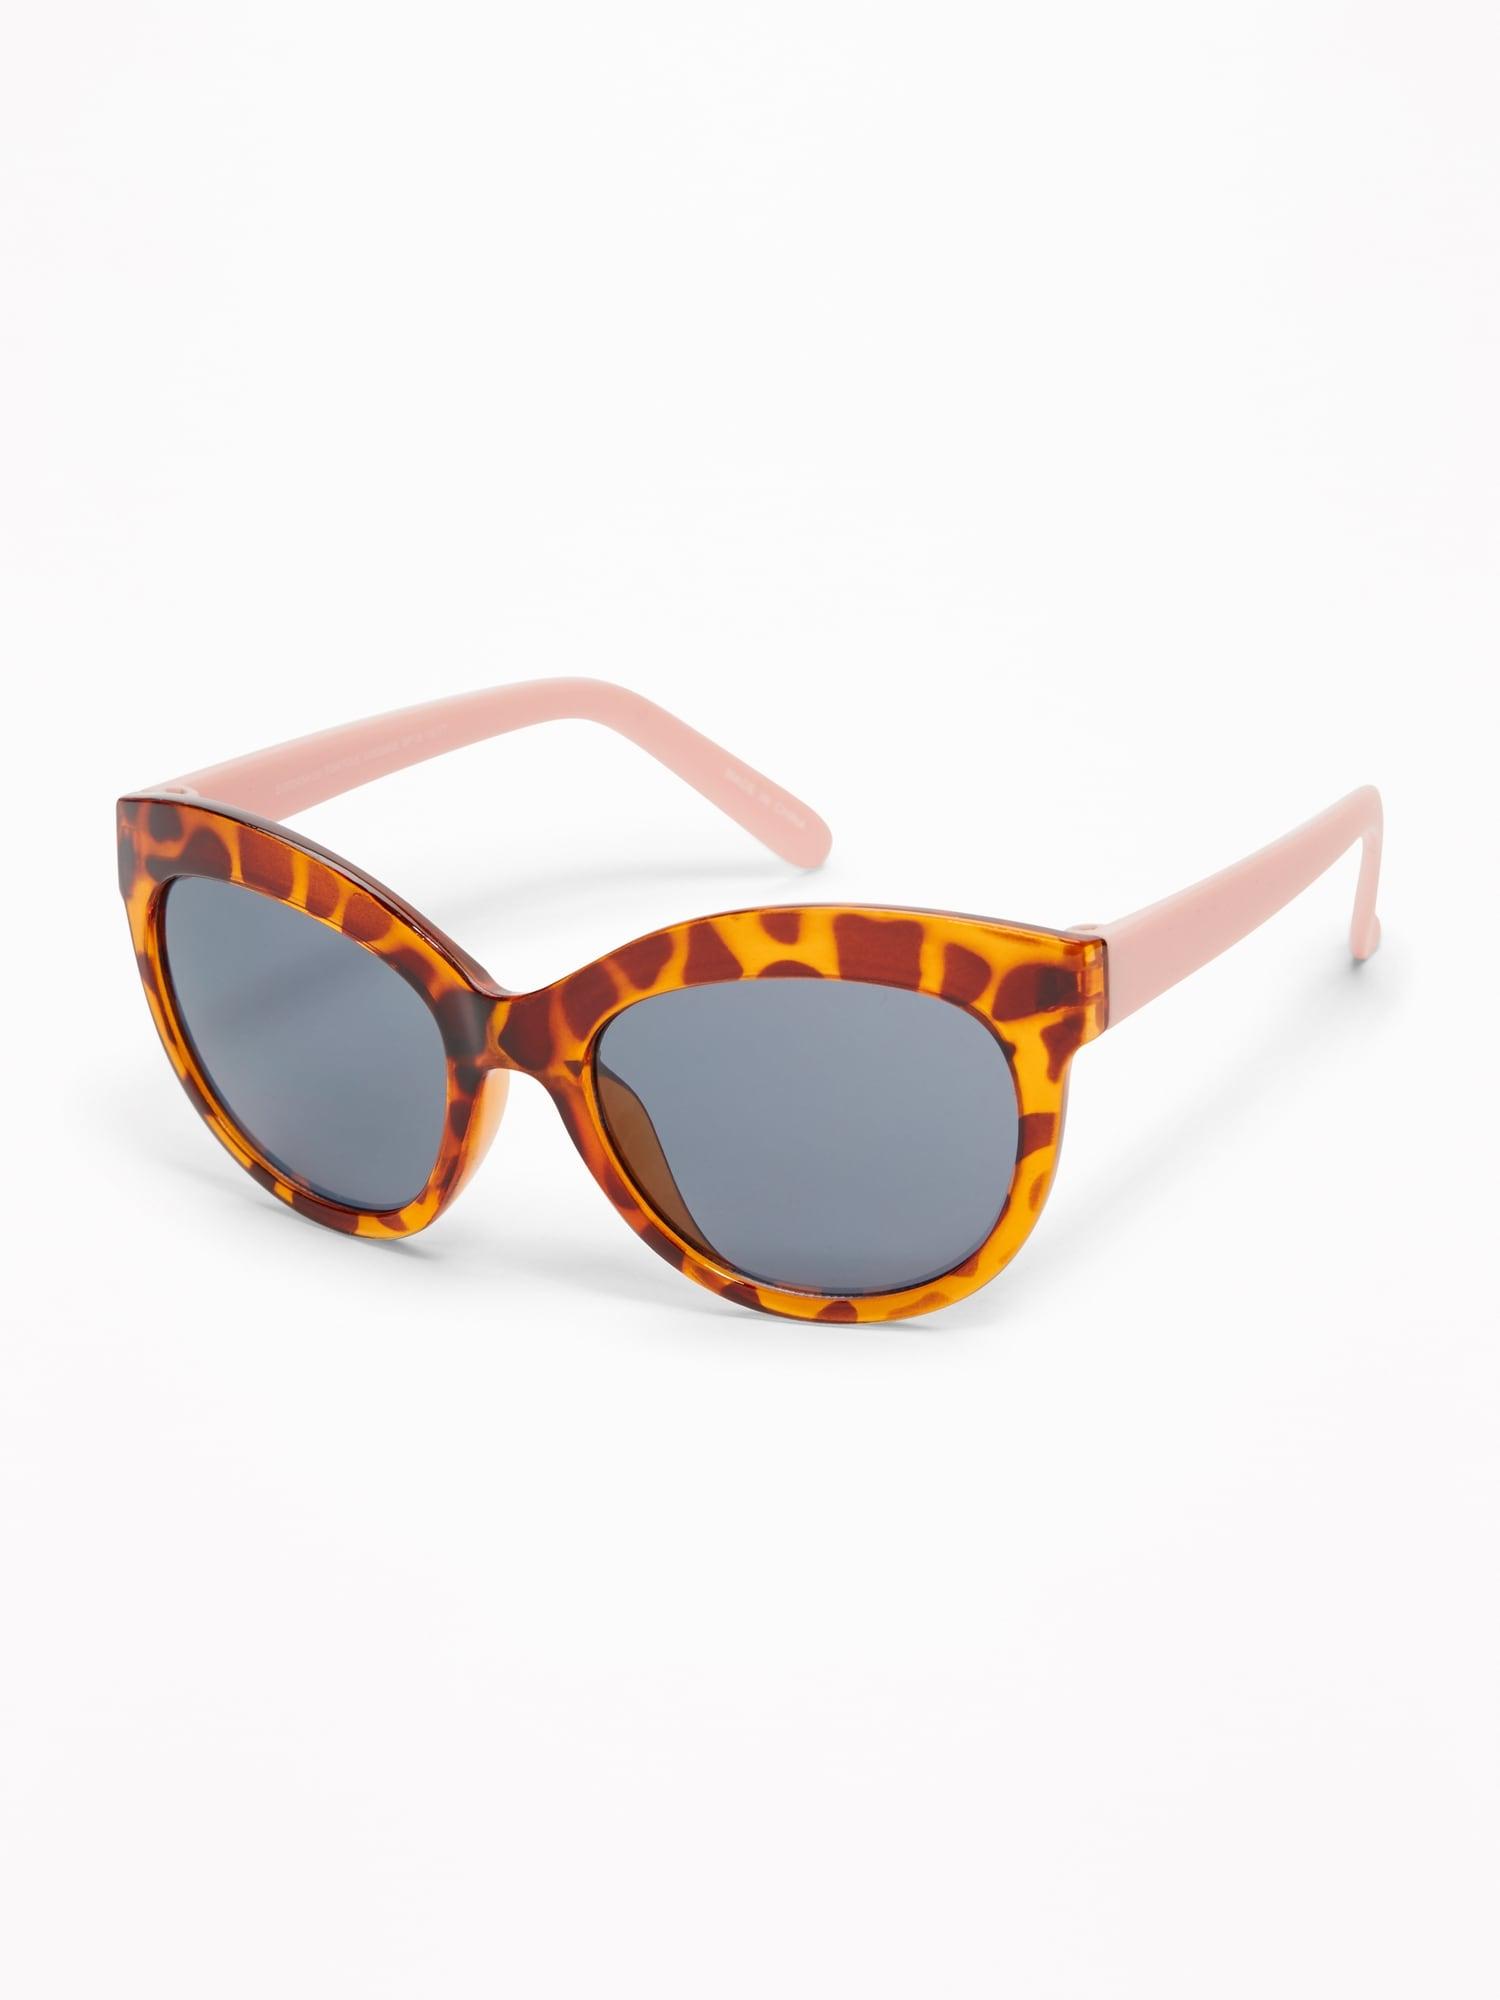 Cute Kids Sunglasses - Baby Sunglasses - Toddler Sunglasses